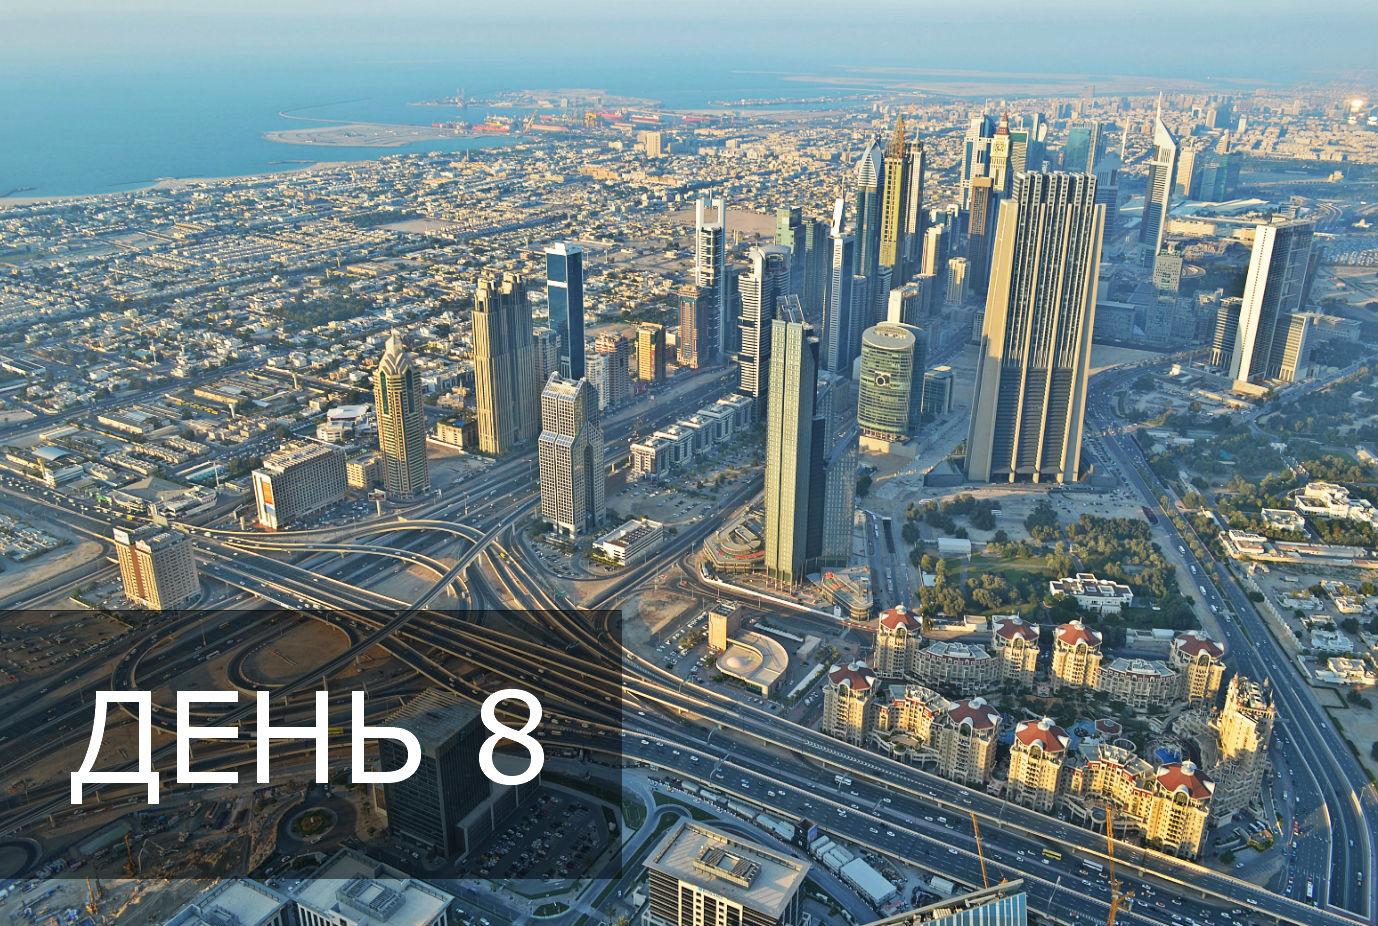 Дубаи, Burj Khalifa (At the Top), Sega World